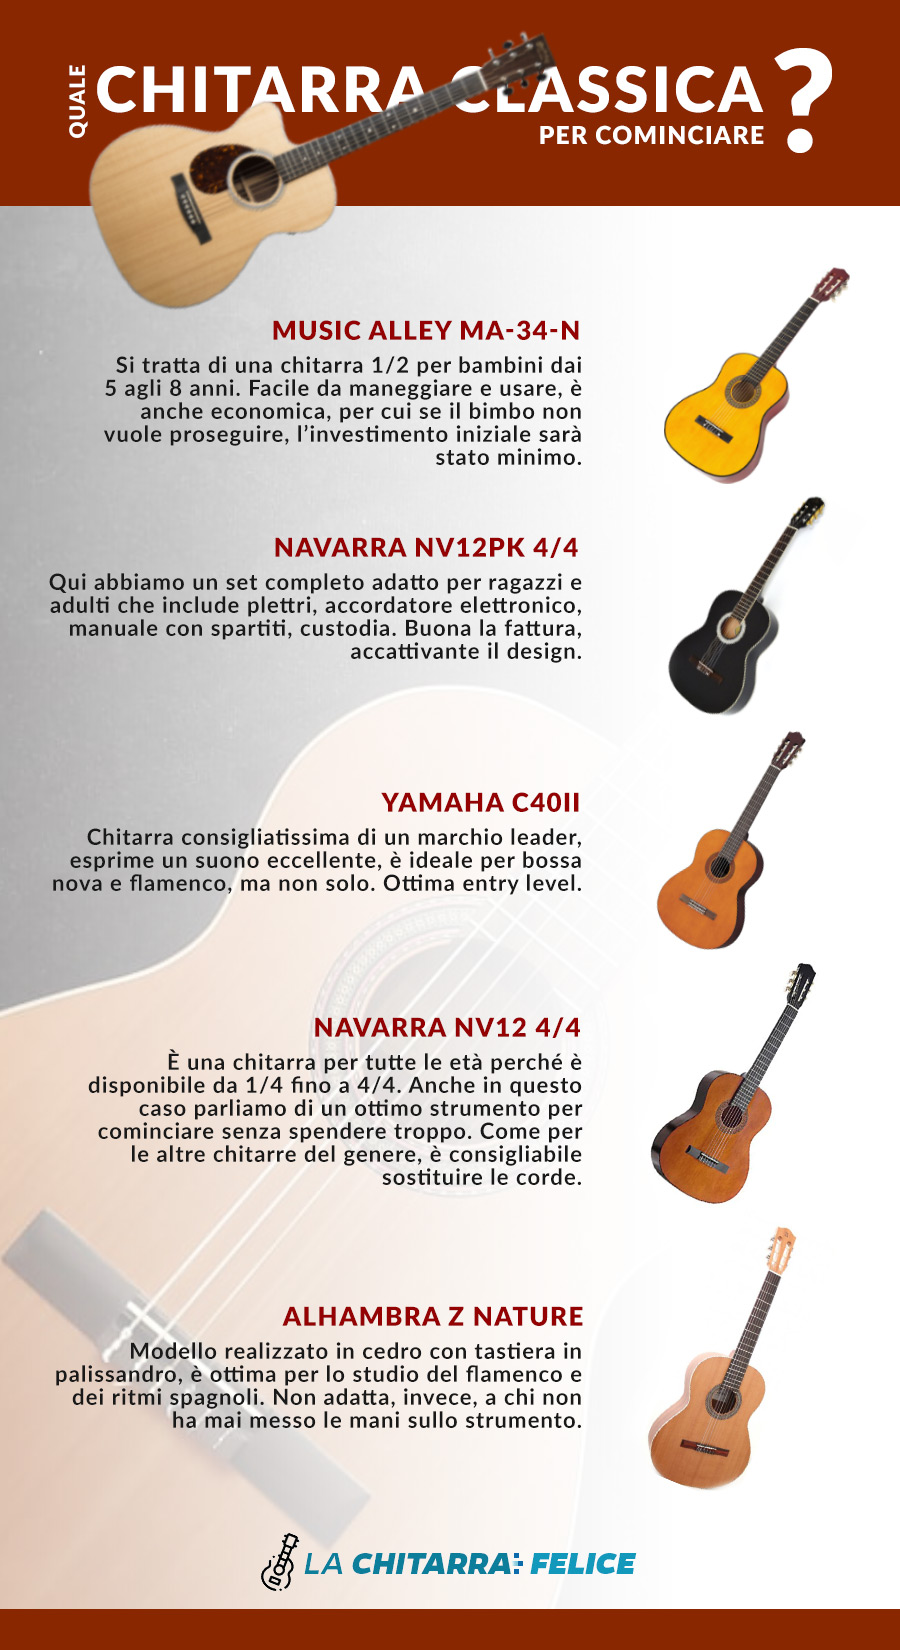 musica alley, navarra, yamah, alhambra